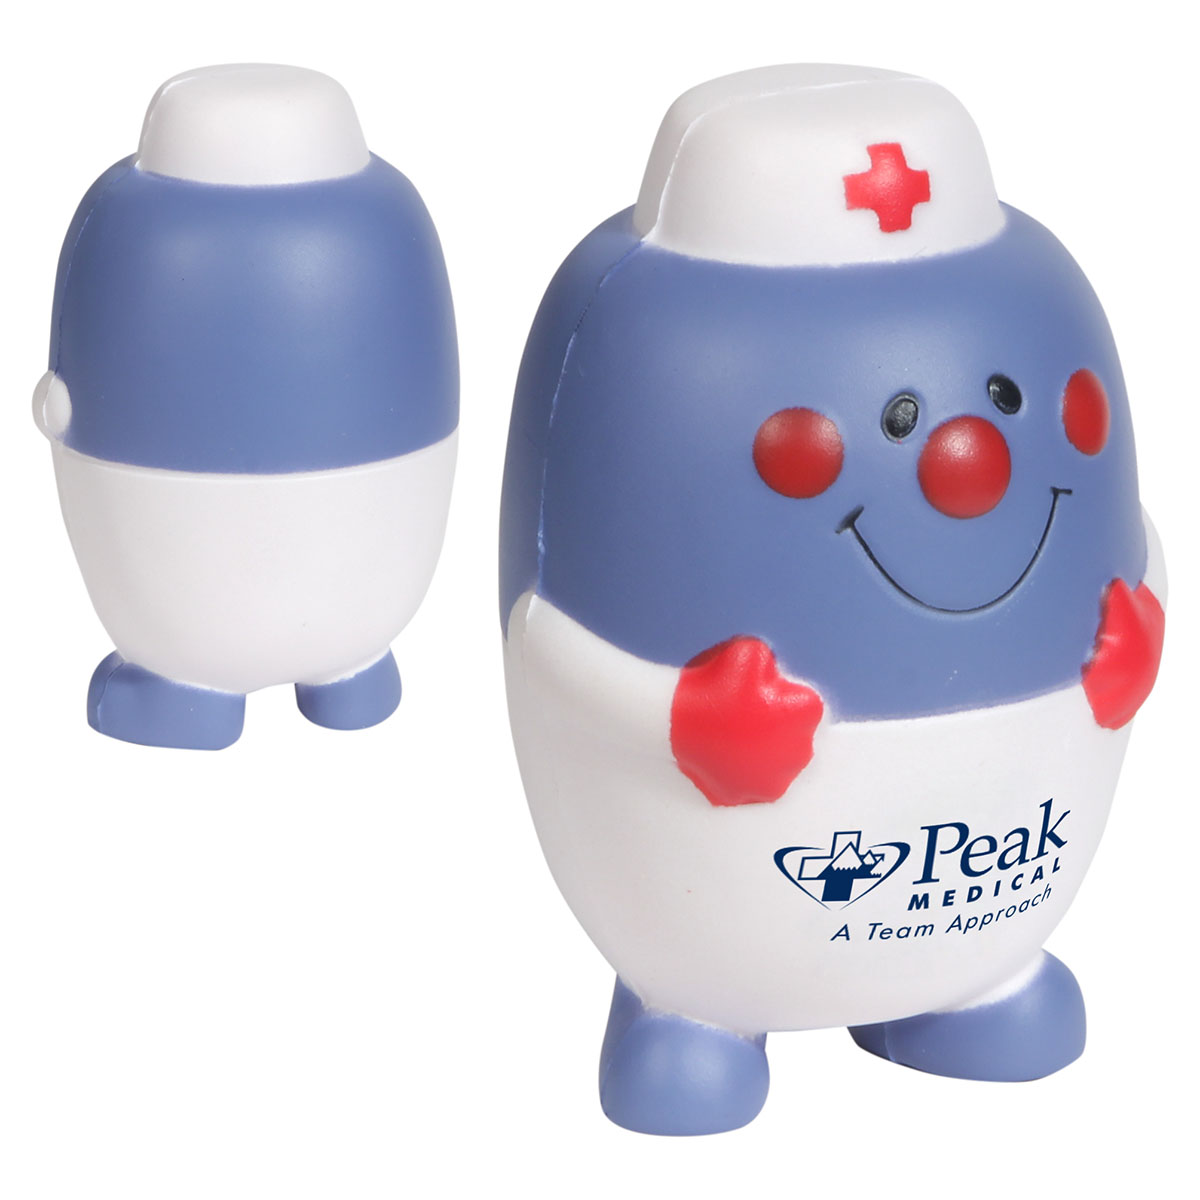 Pill Nurse Stress Reliever, LAN-EM02 - 1 Colour Imprint